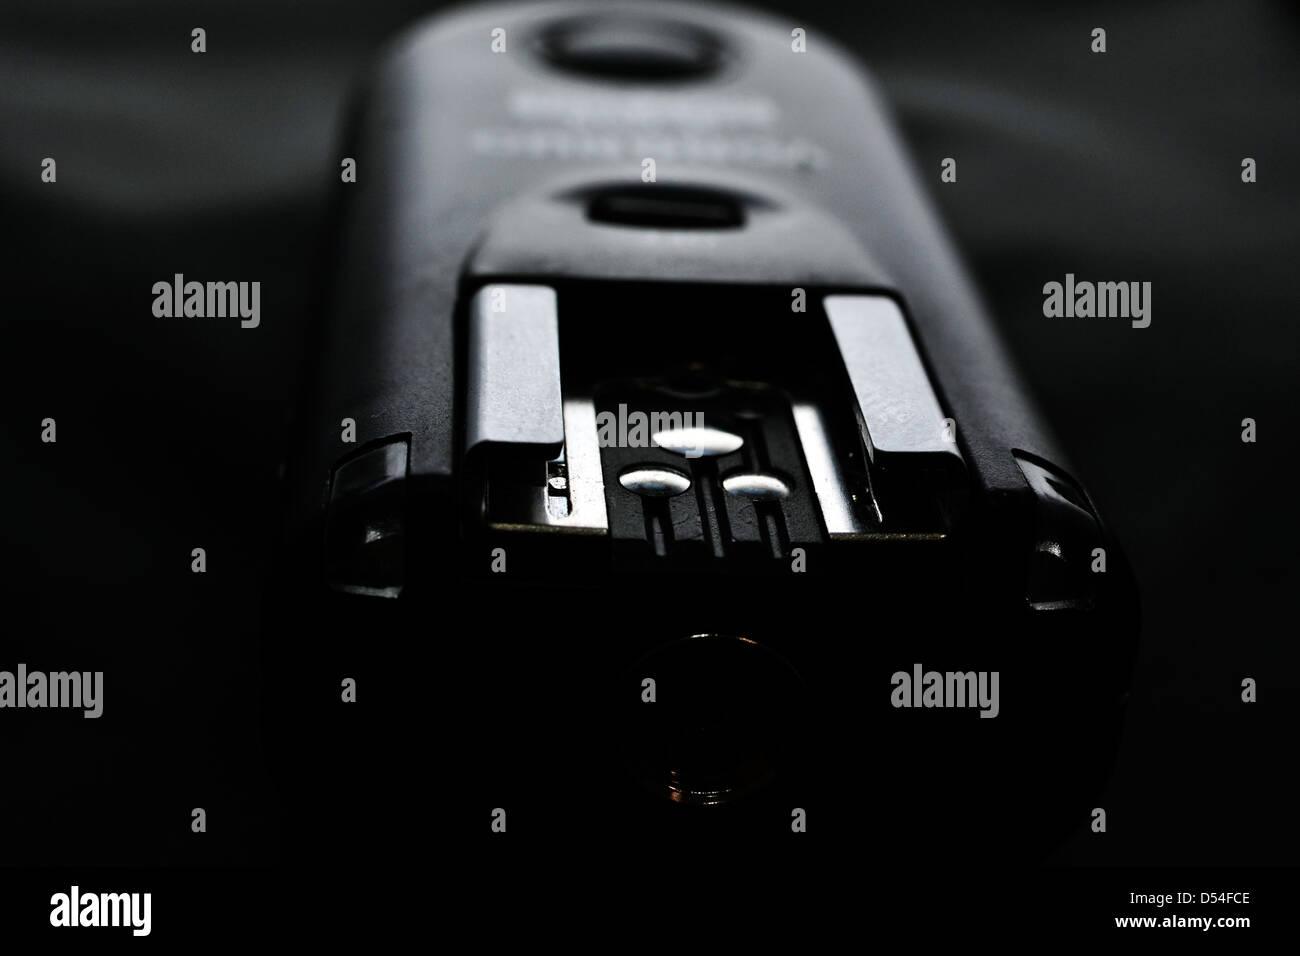 flash trigger - Stock Image